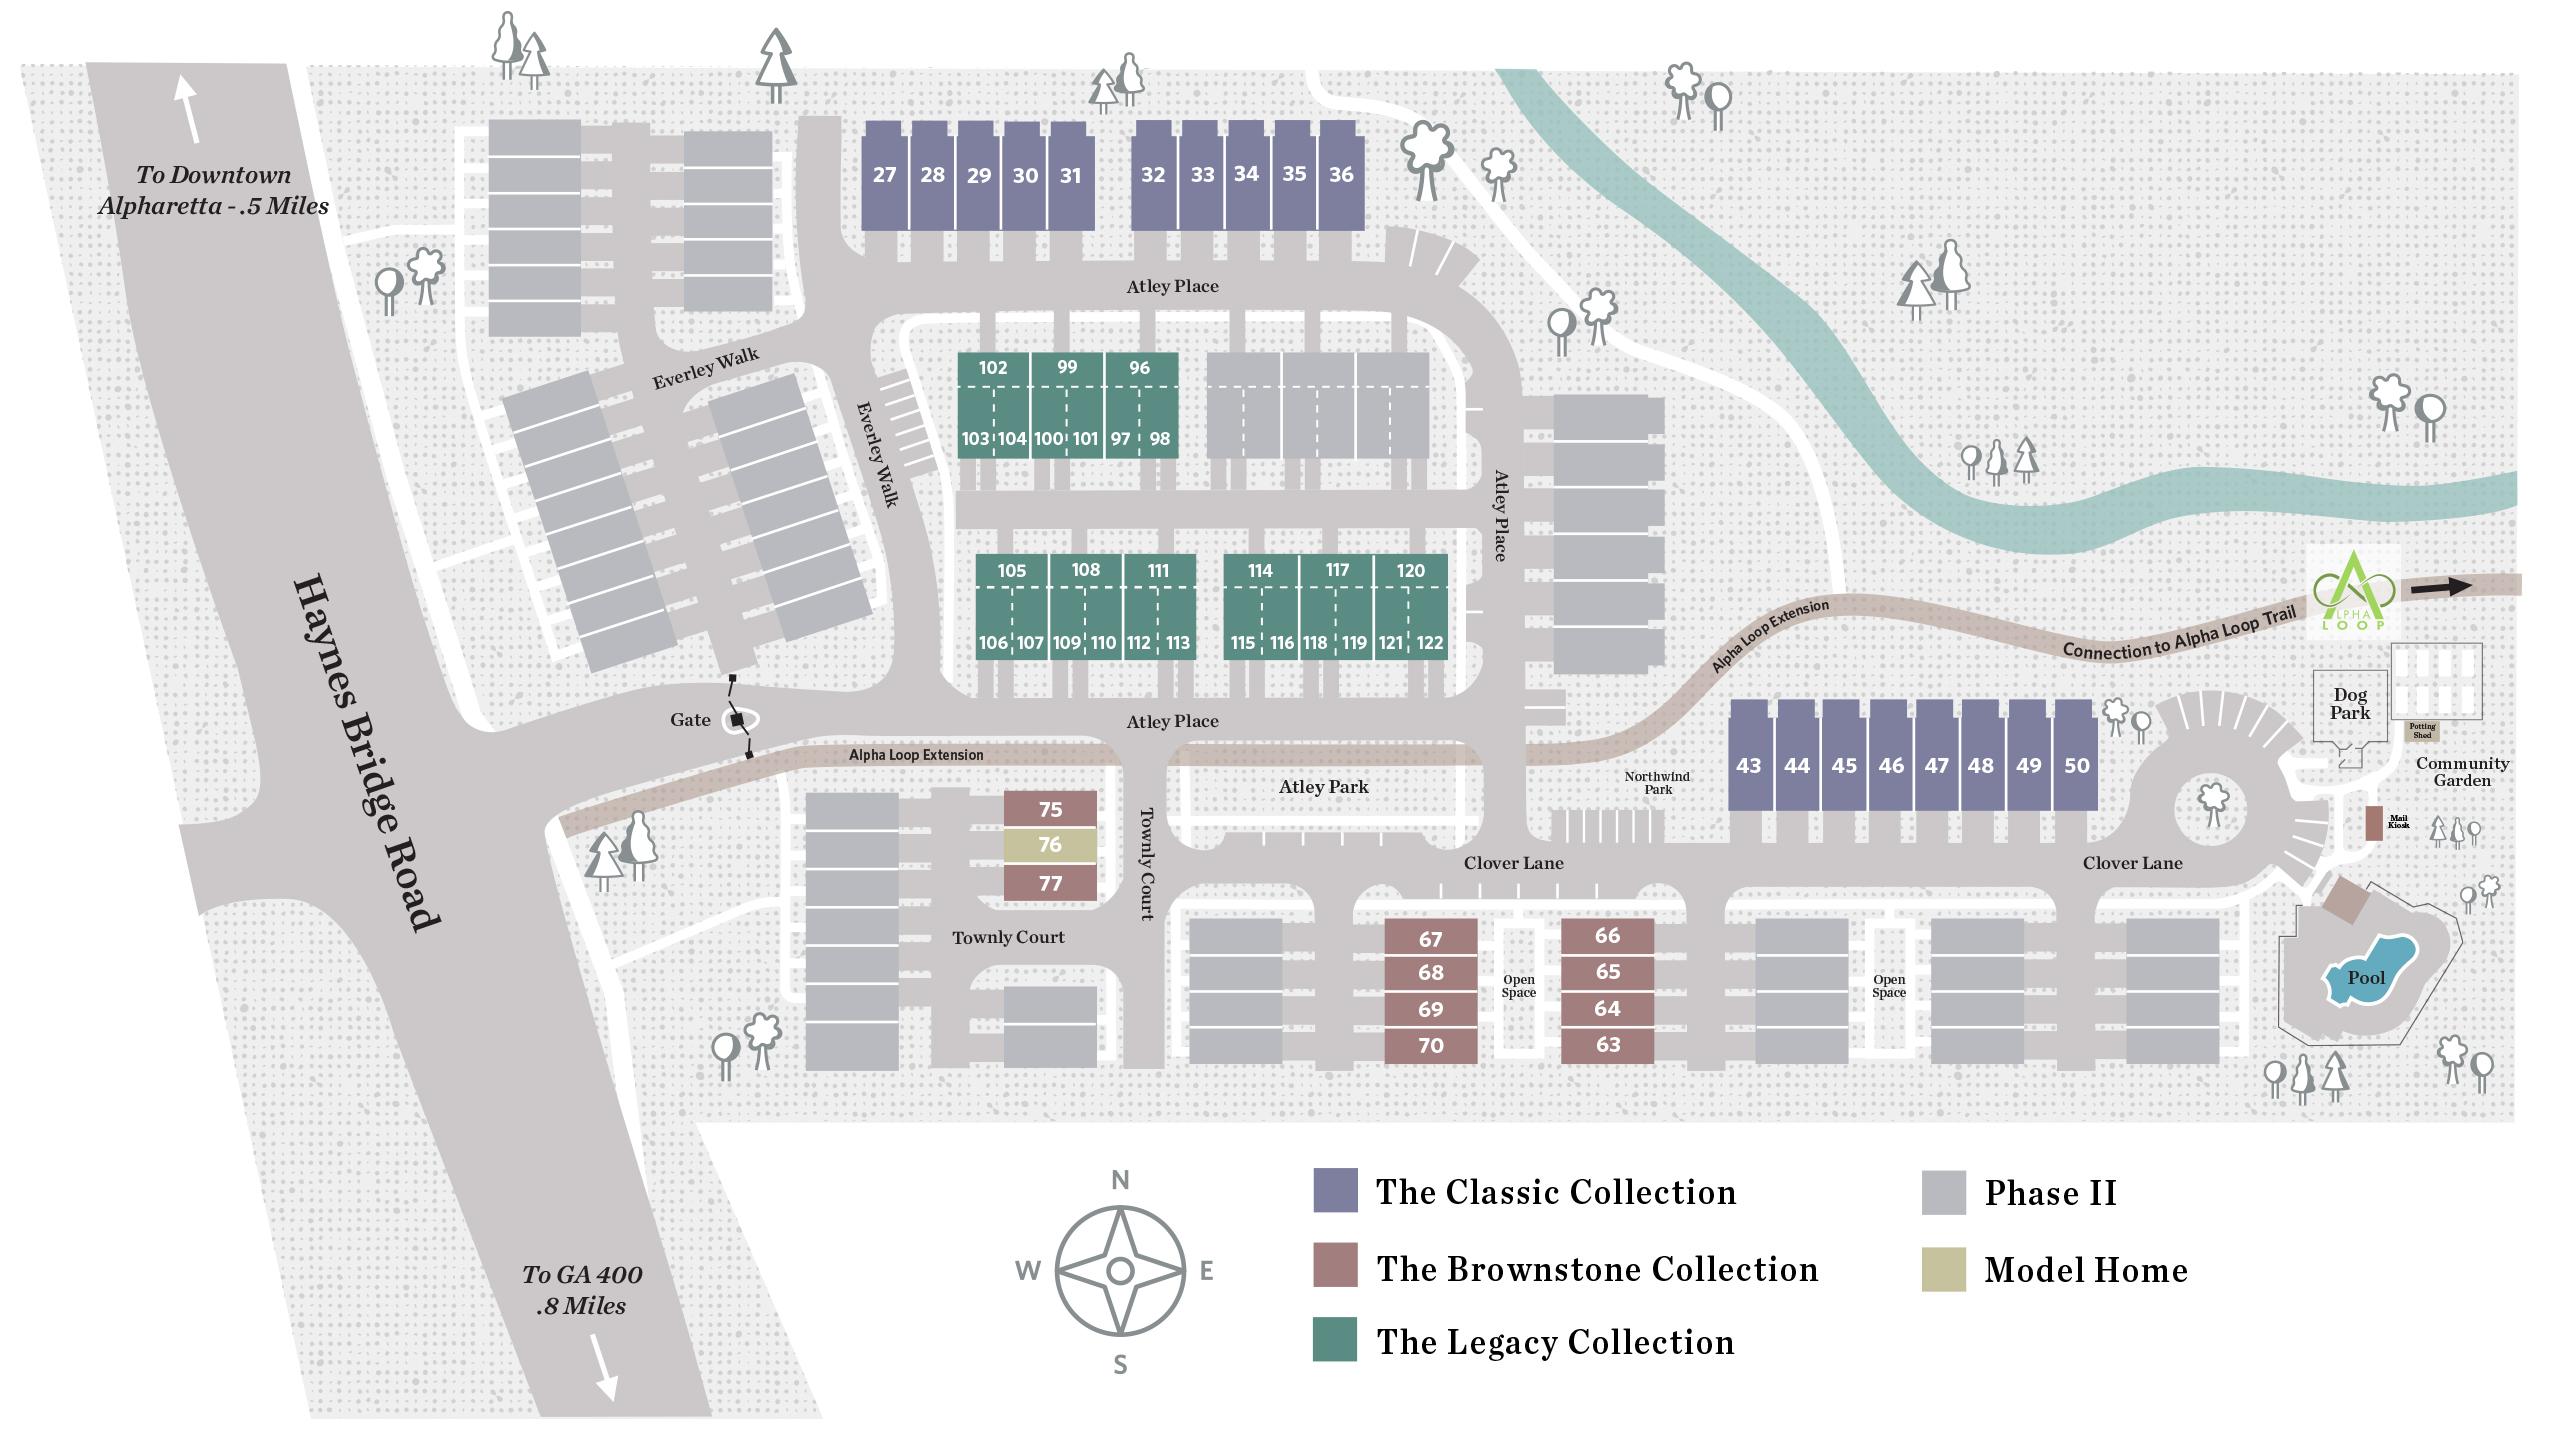 Alpharetta, GA Atley New Homes from The Providence Group